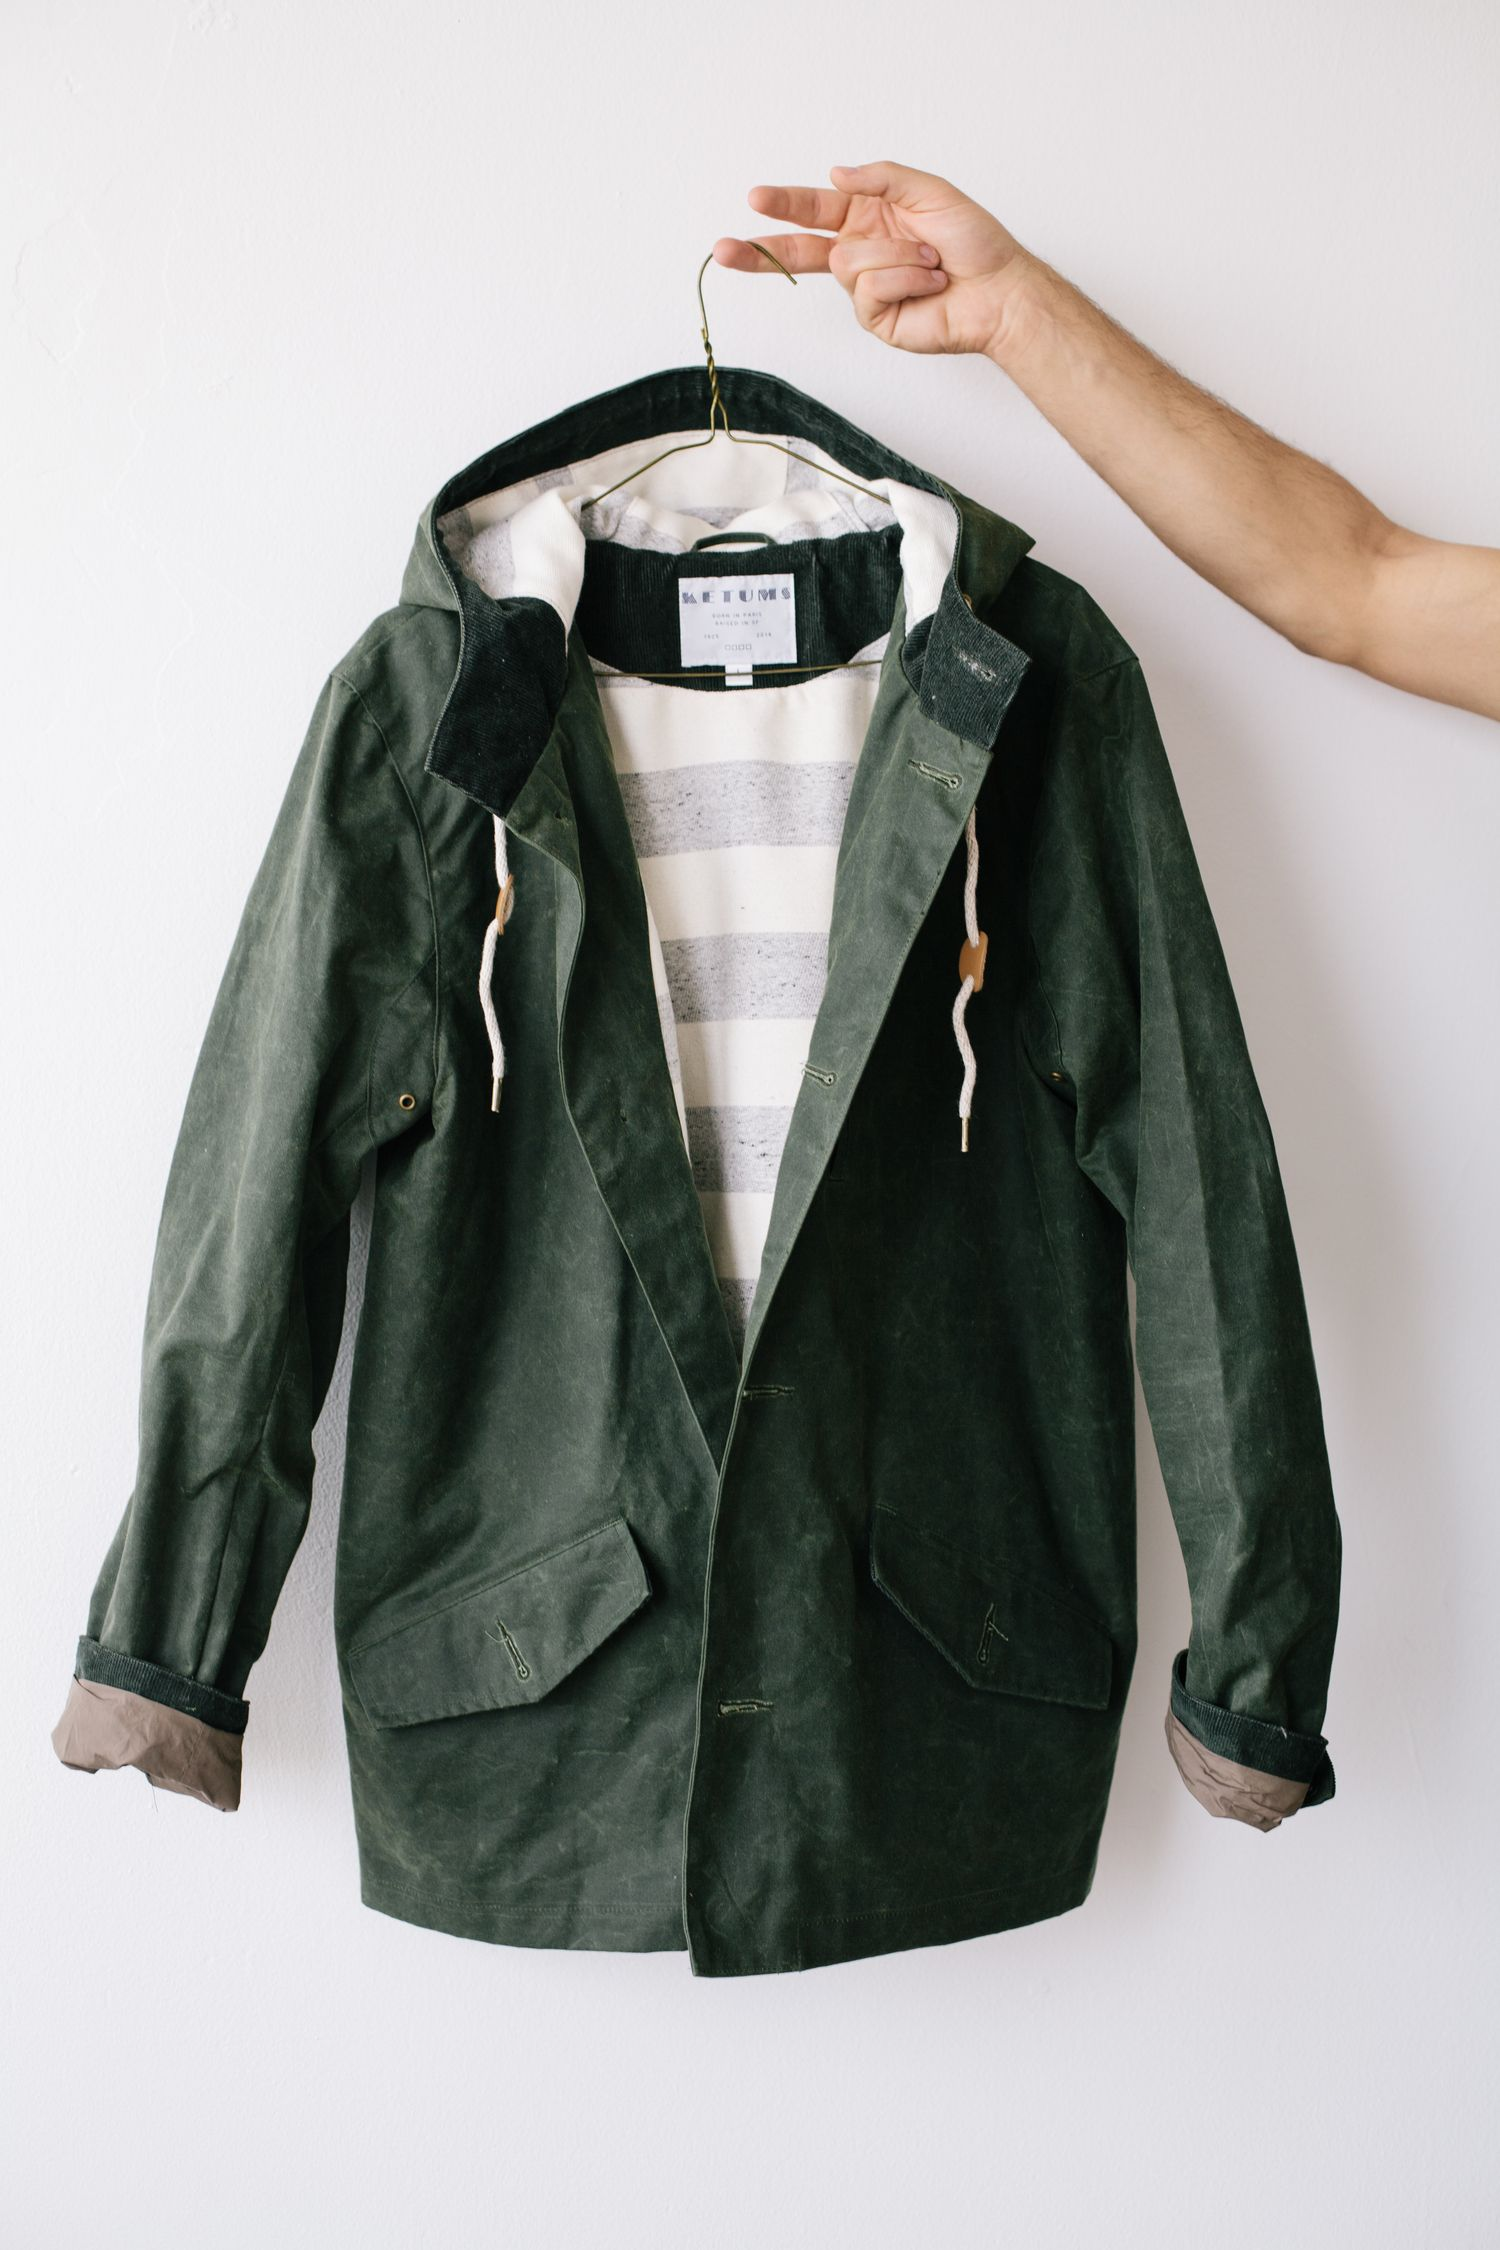 Mans khaki green rain coat long loose trench coat olive khak green rain coat size M/L H5MFT